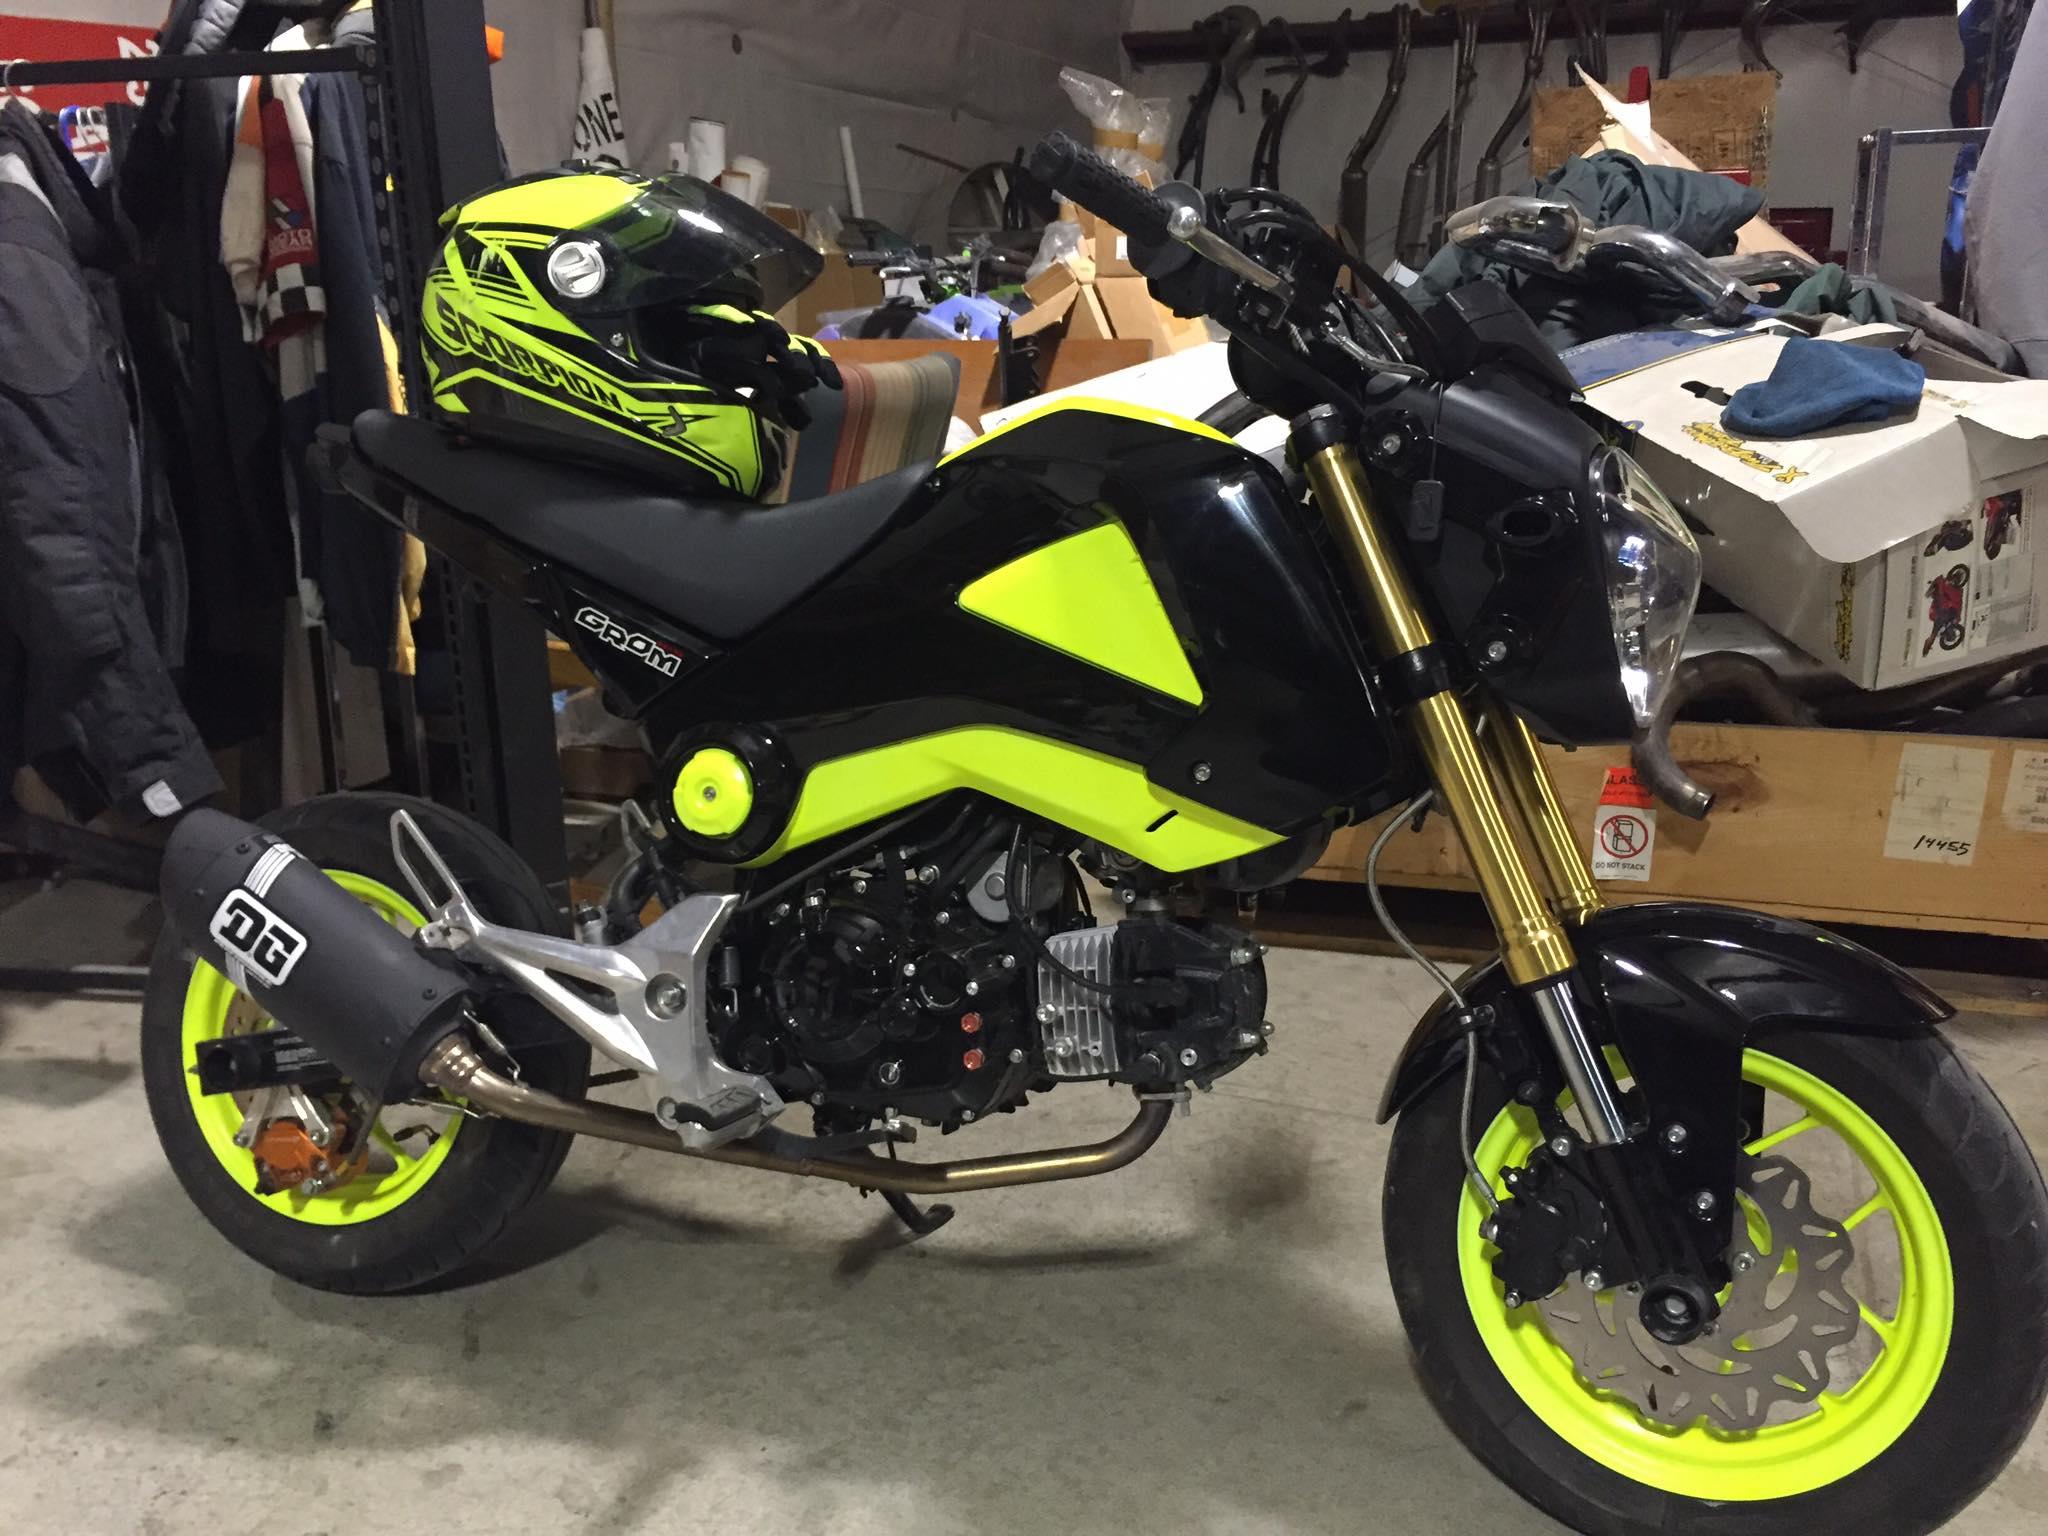 Blaze Yellow & Black Stunt/Race Build-13248403_10153437060426755_4116536547424640391_o.jpg